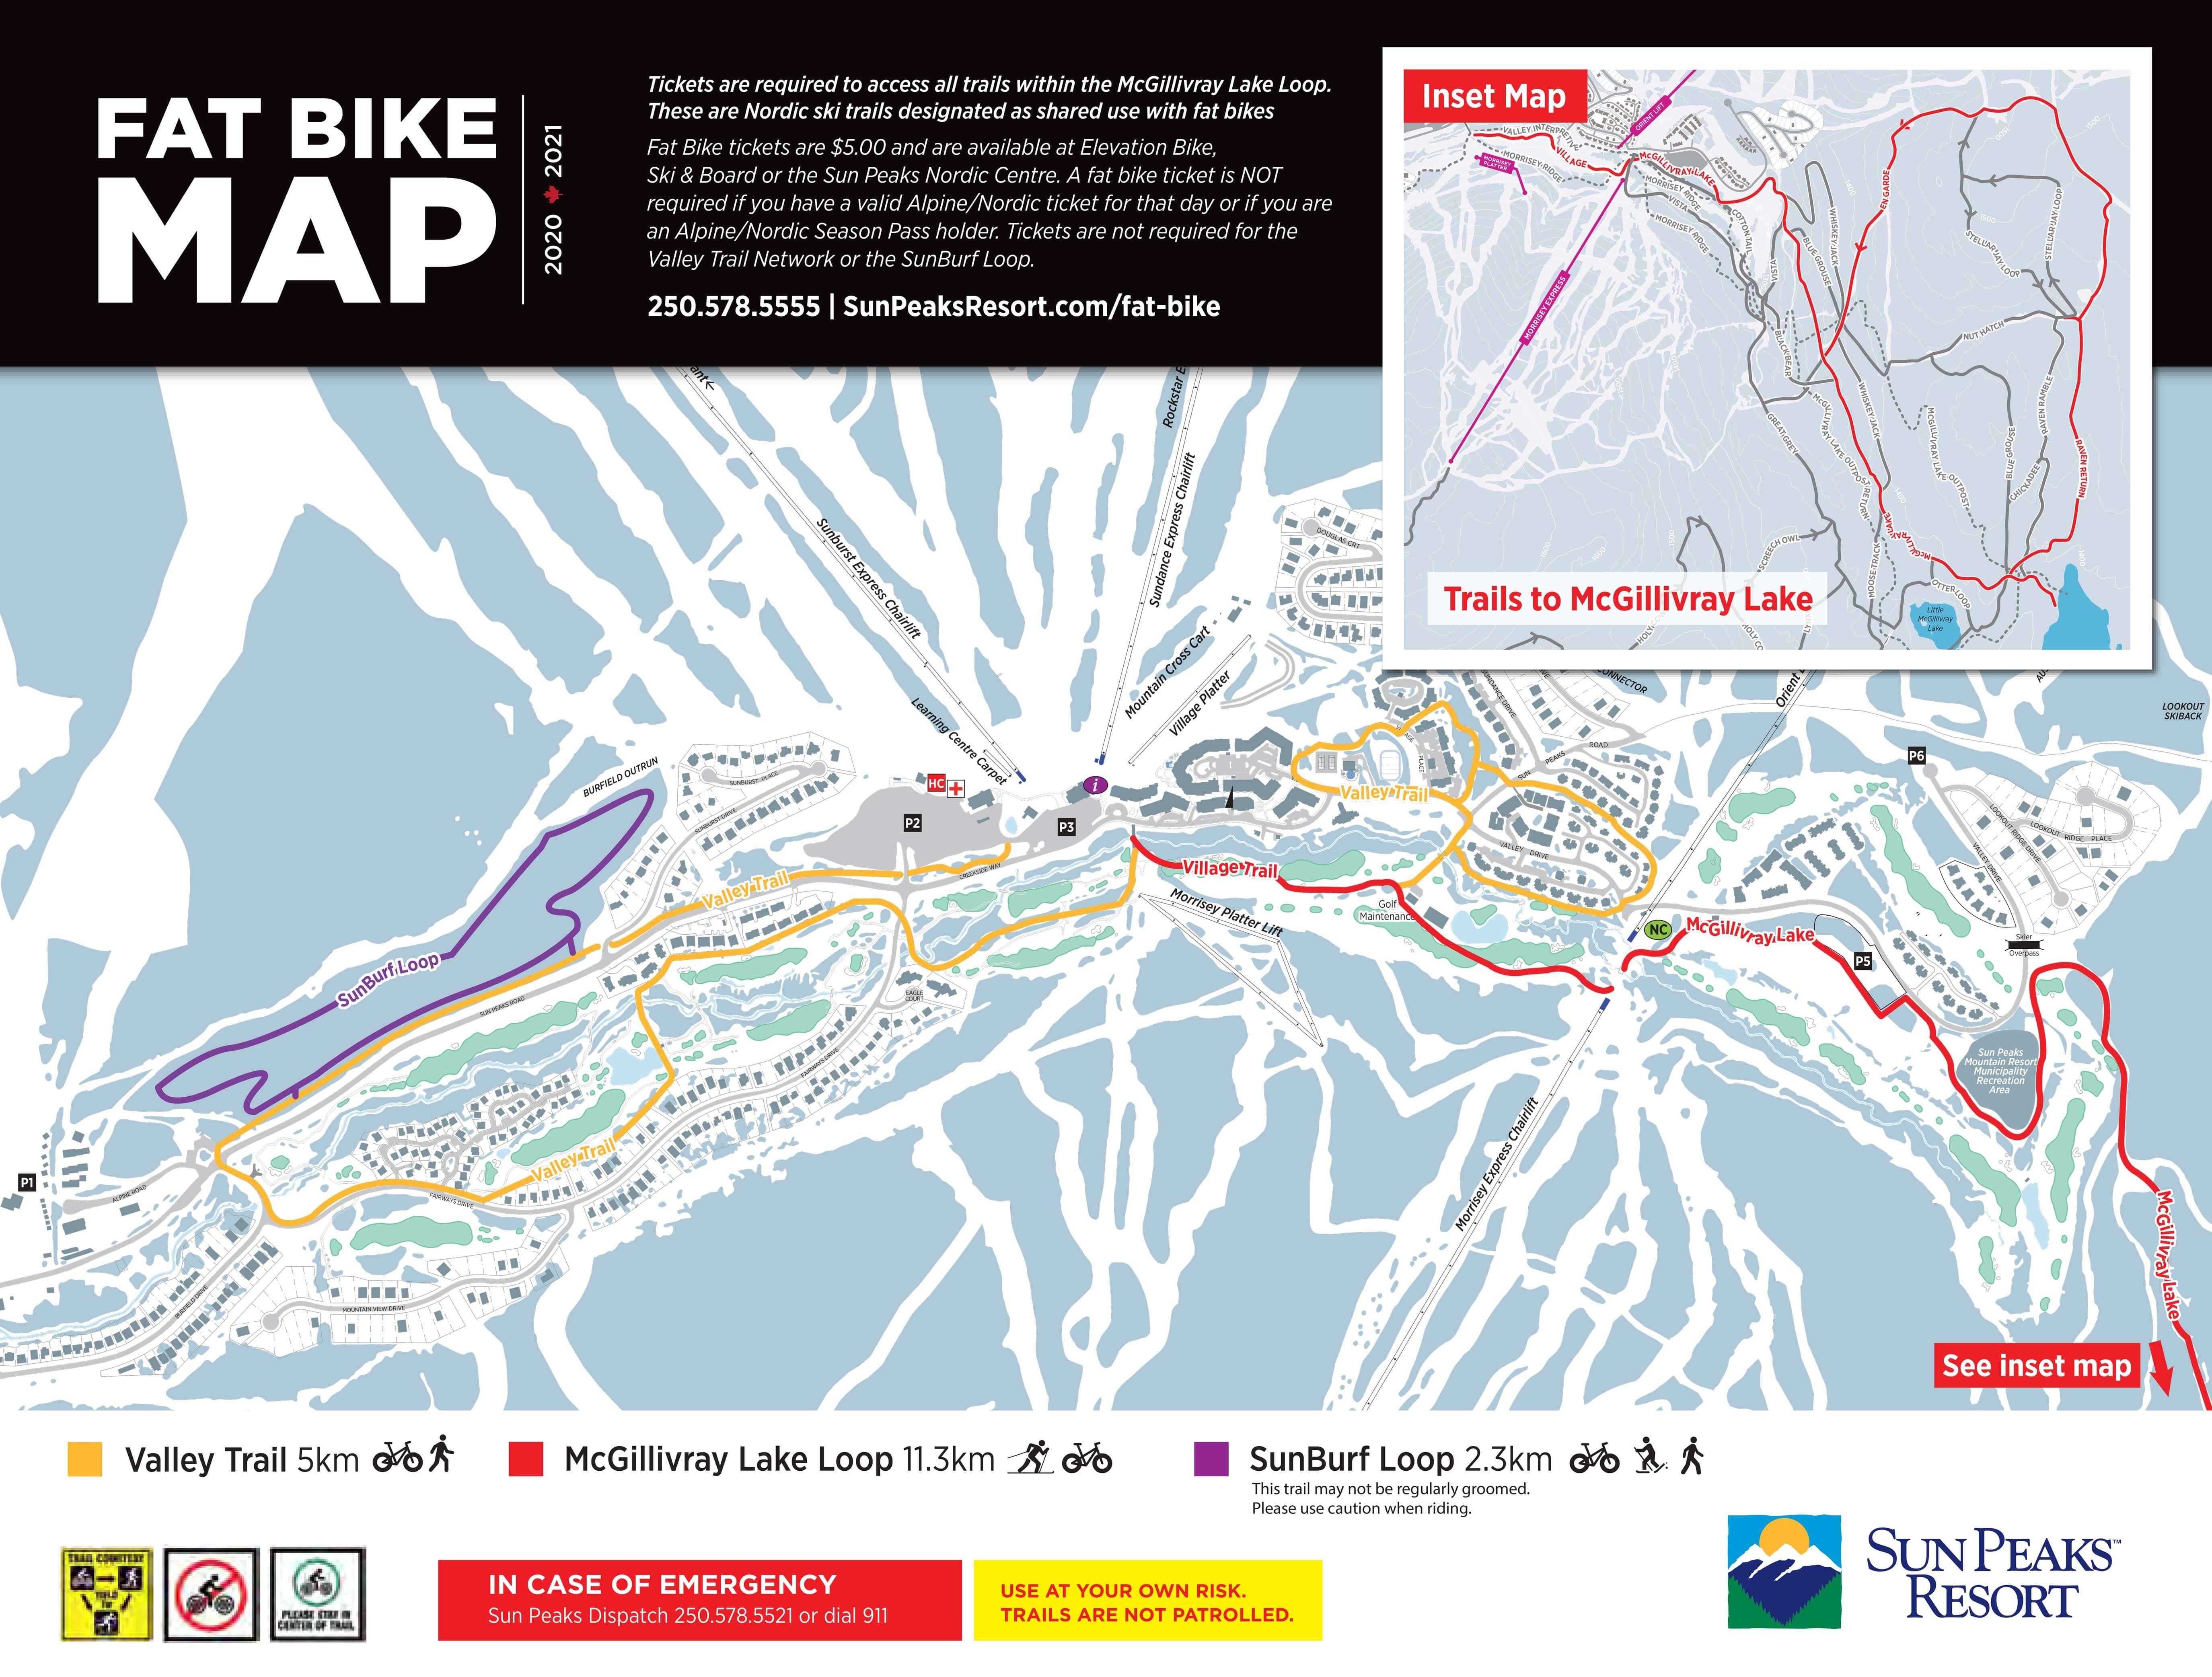 Sun Peaks Fatbike Trail Map